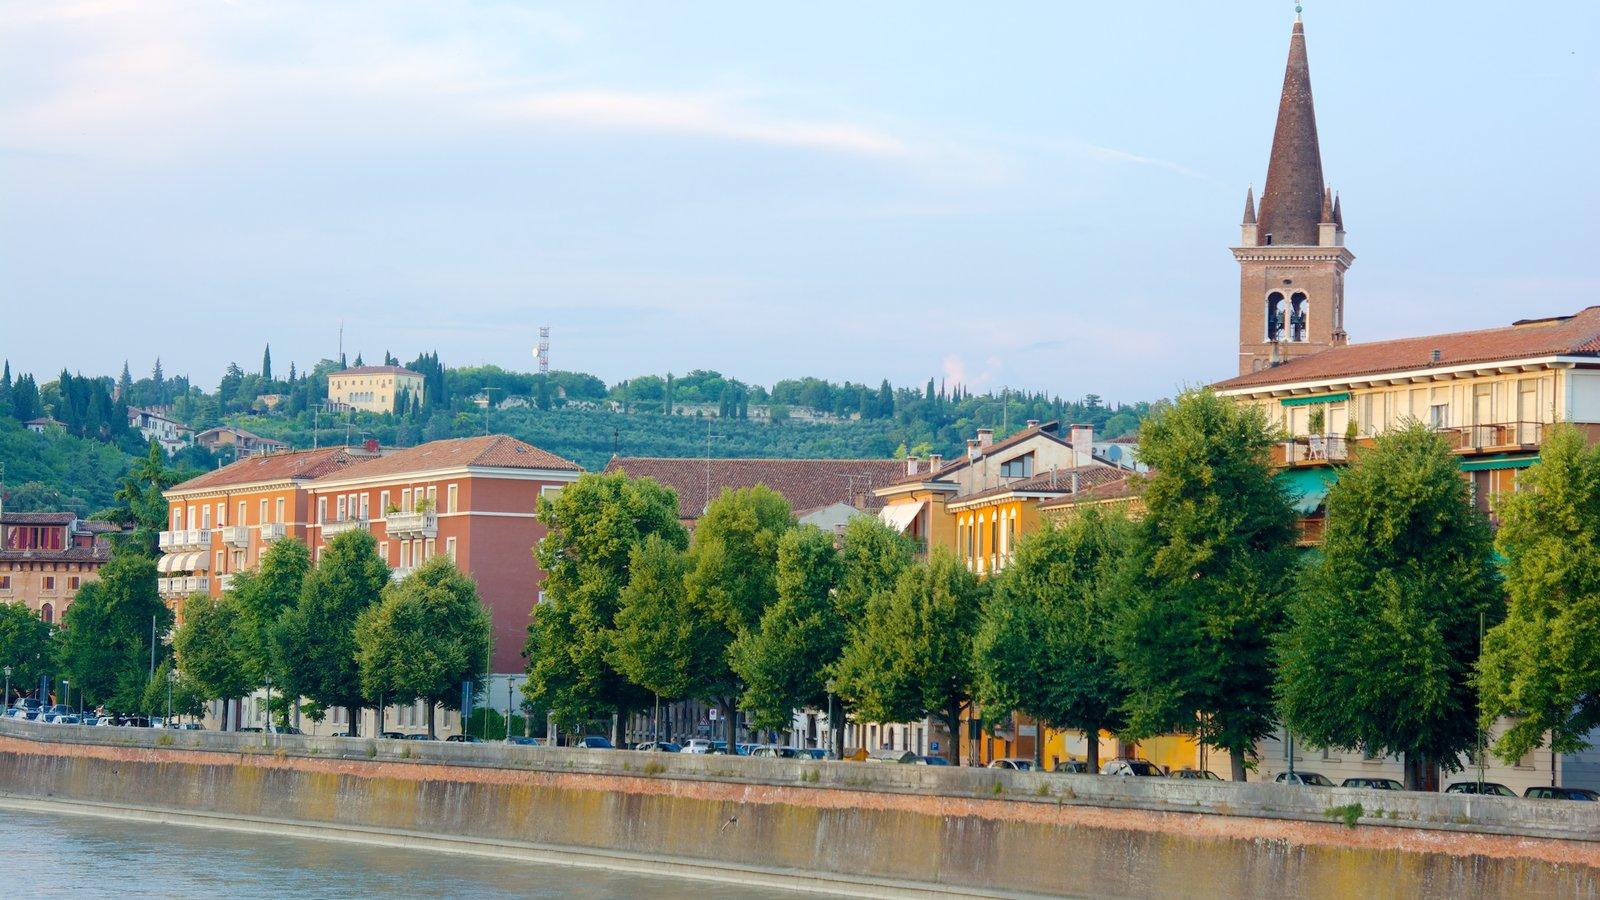 Verona showing a river or creek